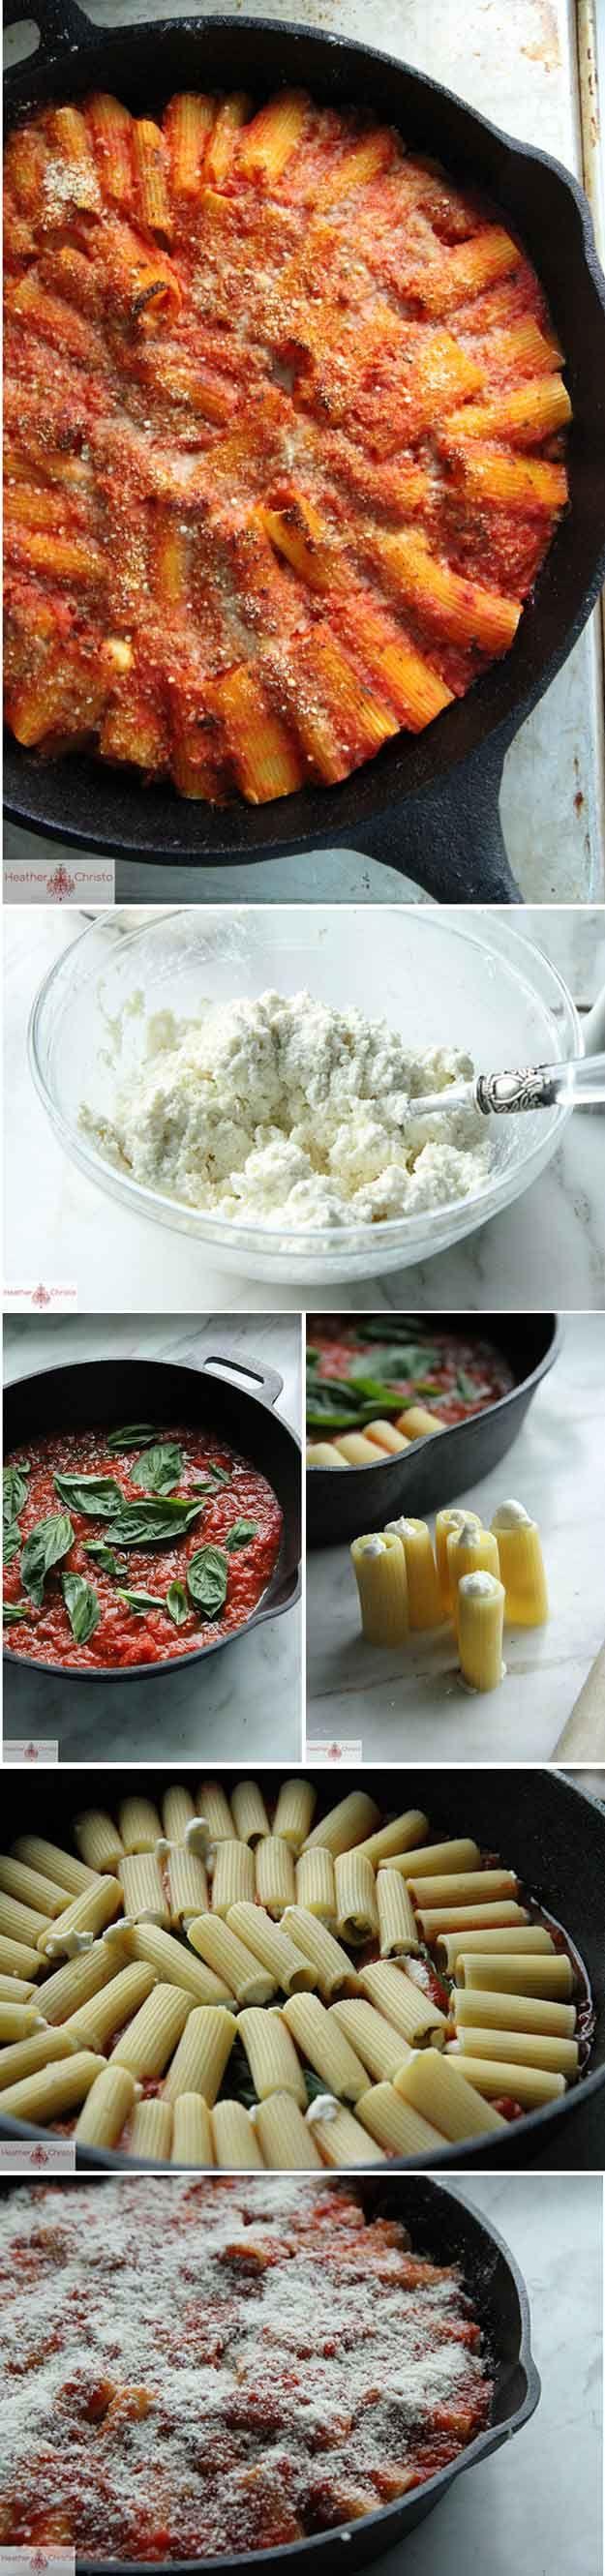 Skillet Baked Stuffed Rigatoni | 21 Savory Cast Iron Skillet Dinner Recipes